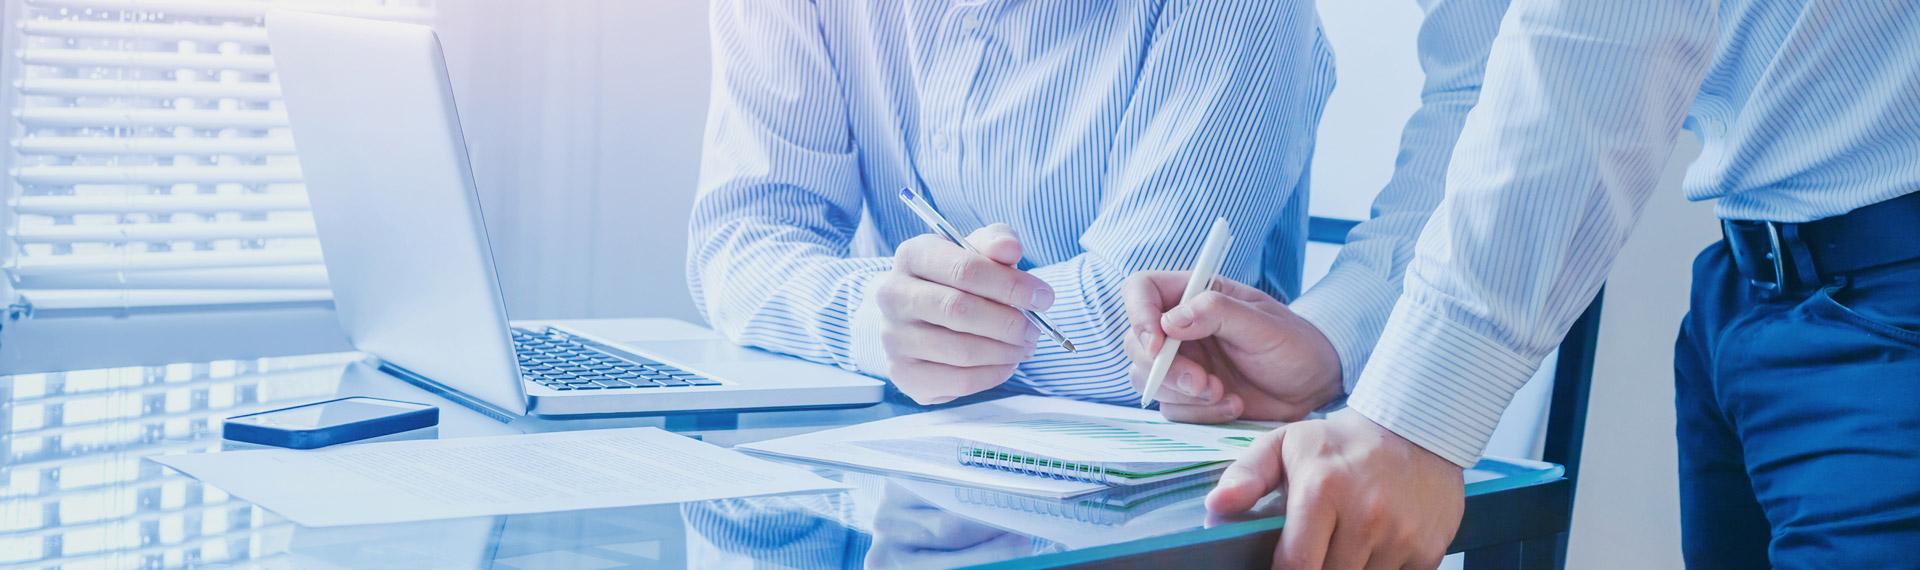 header-rights-obligations-of-shareholders